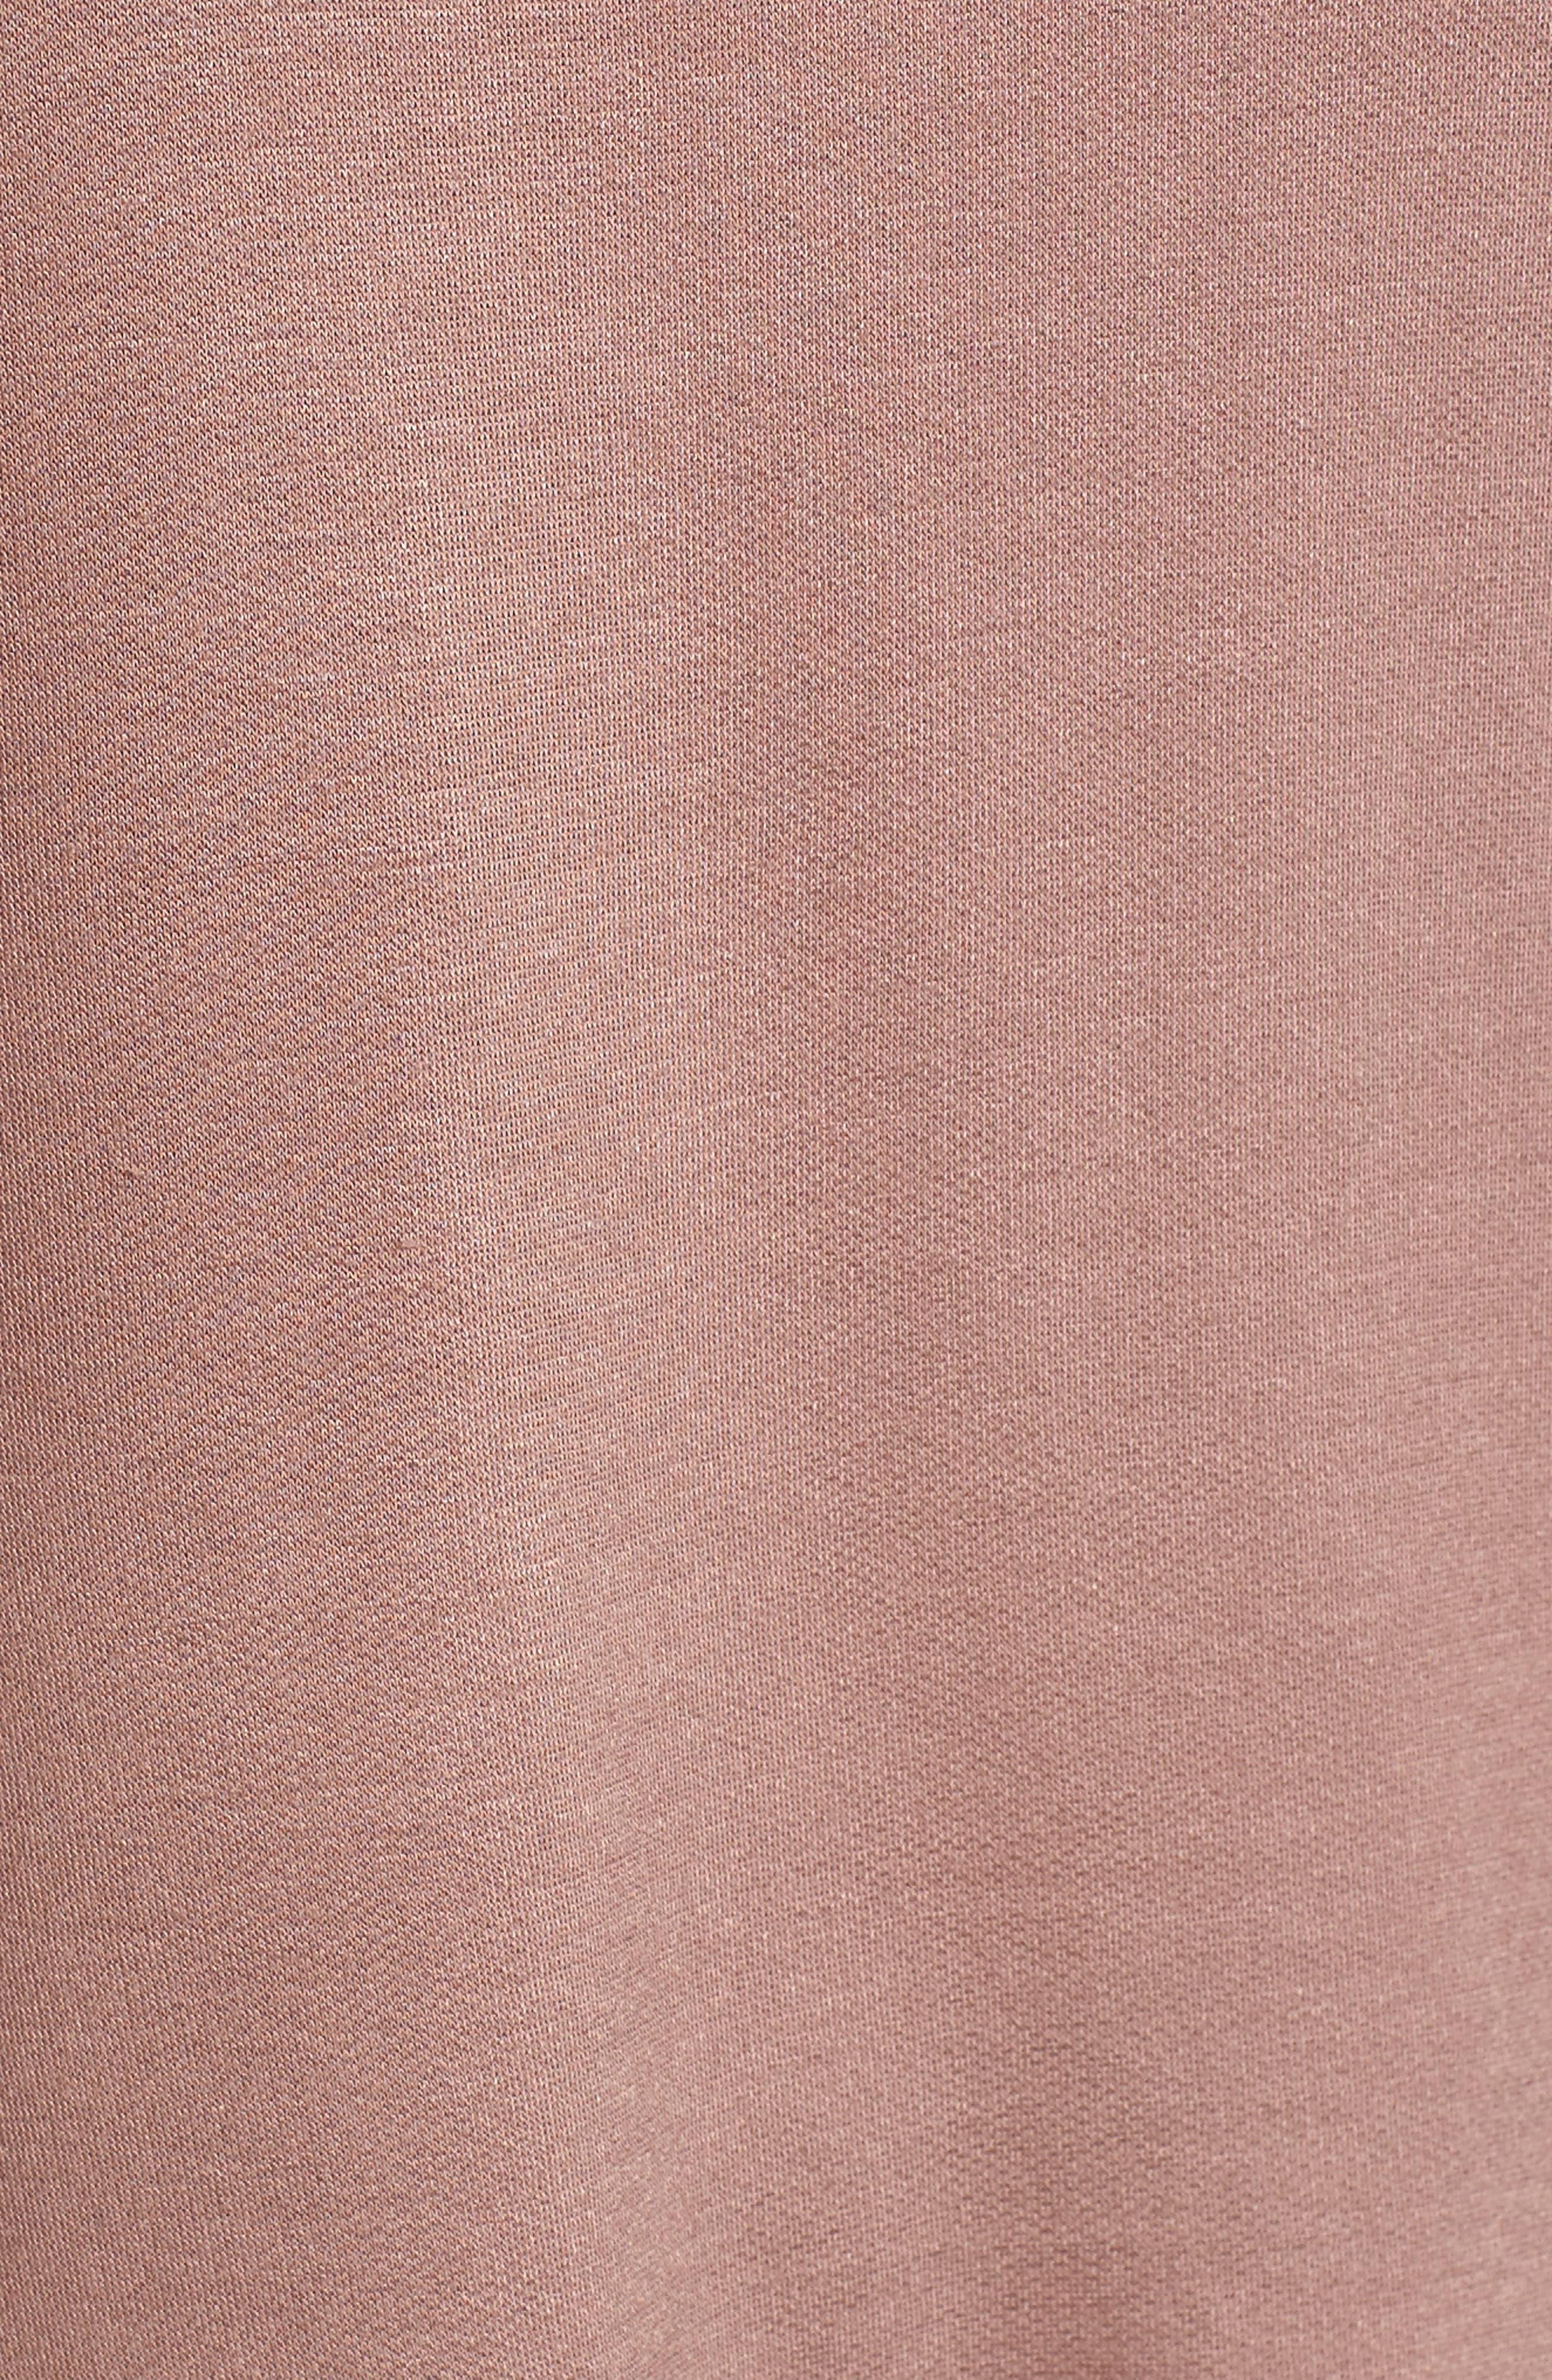 High/Low Cold Shoulder Sweatshirt,                             Alternate thumbnail 18, color,